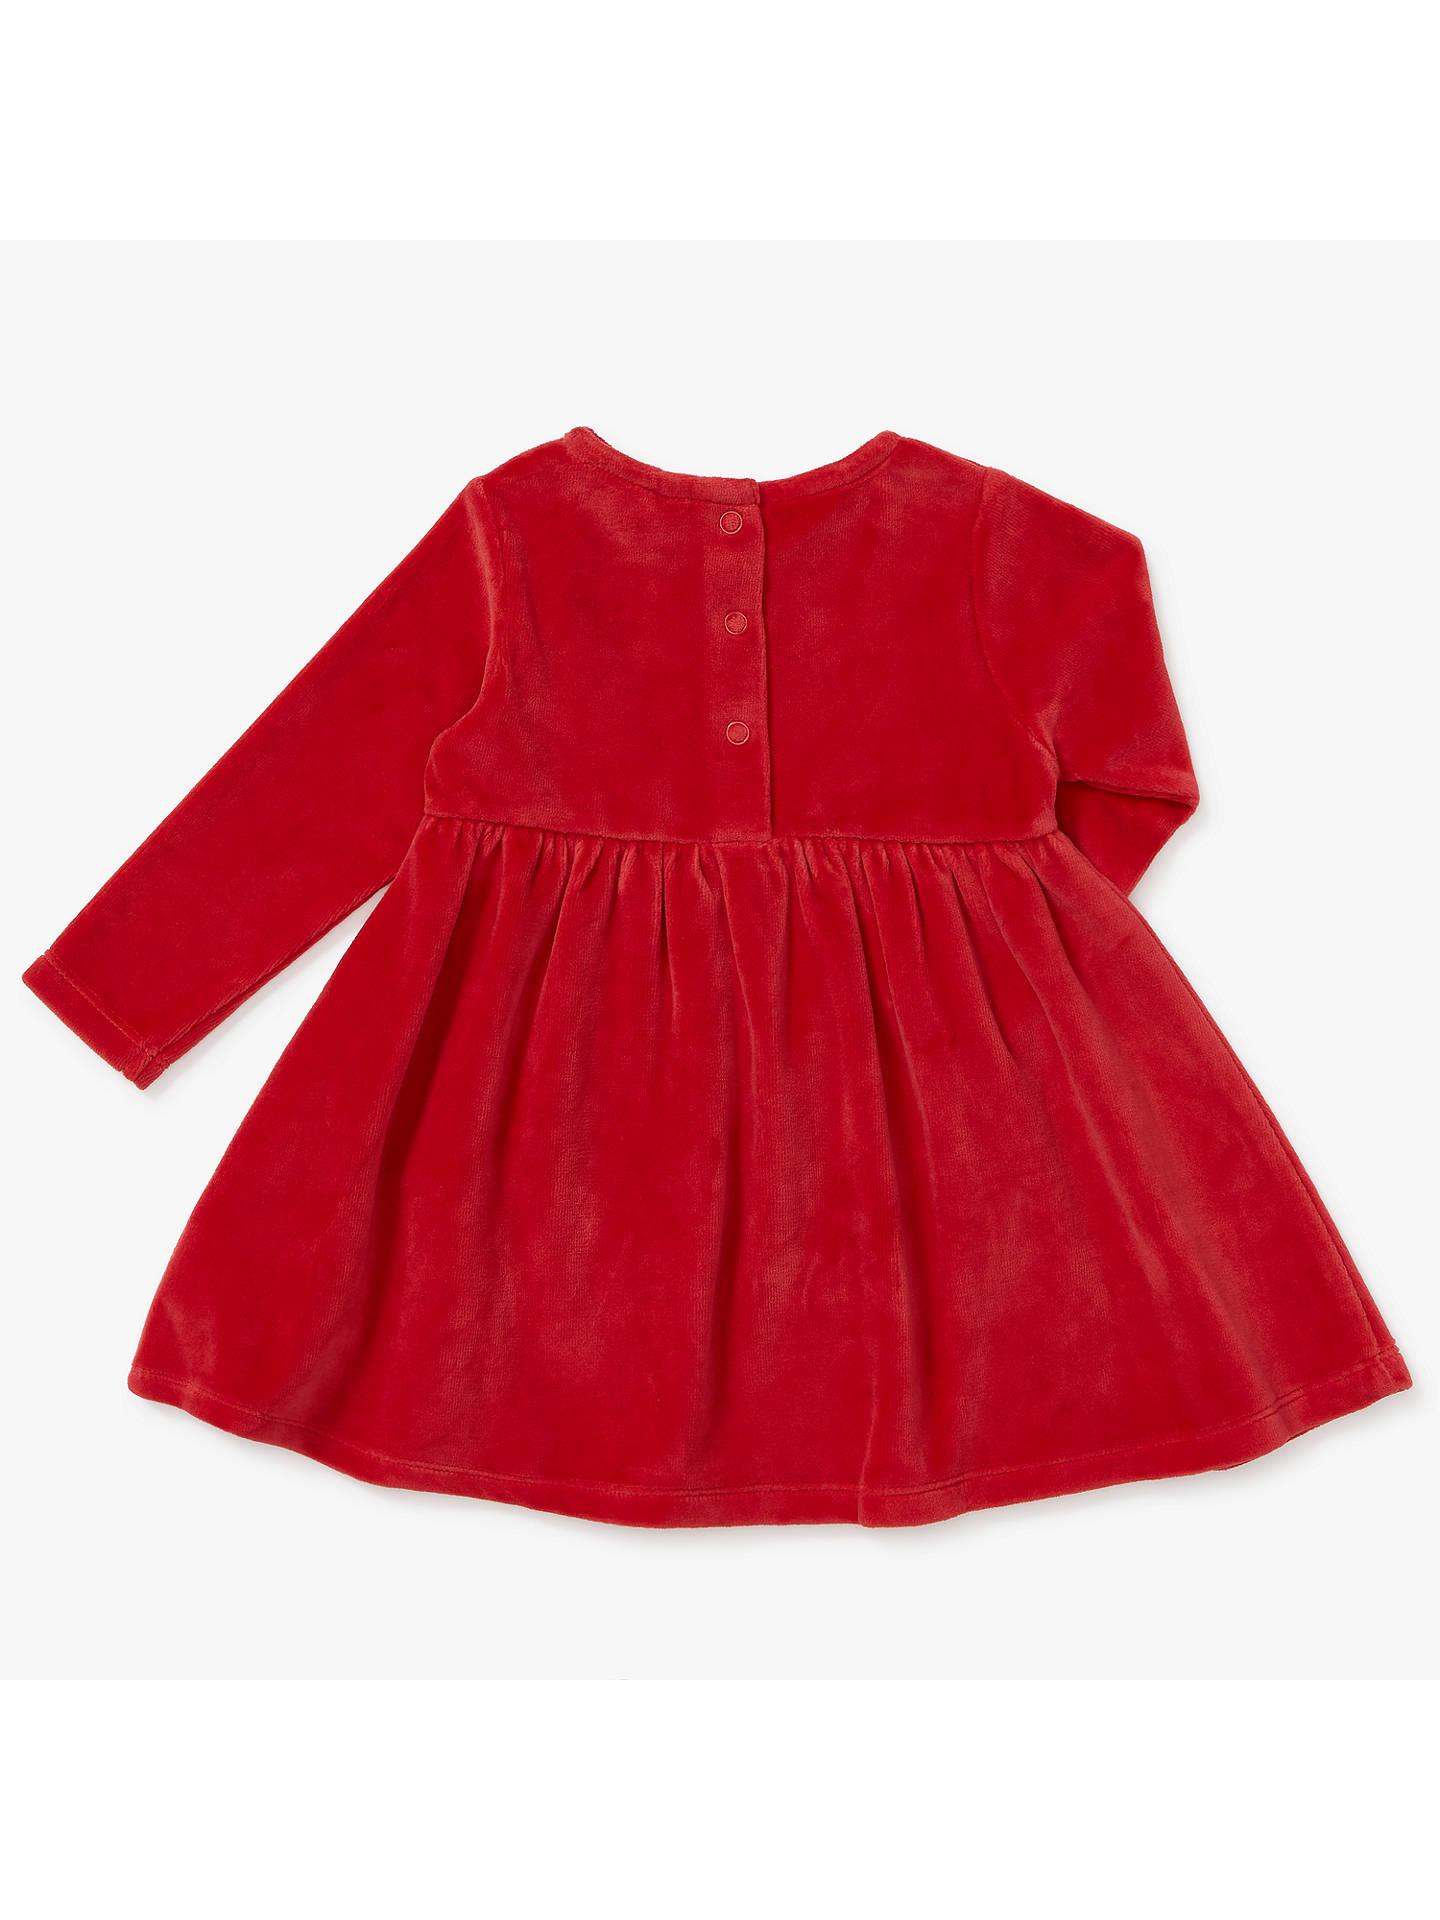 John Lewis Baby Christmas Border Dress, Red at John Lewis & Partners